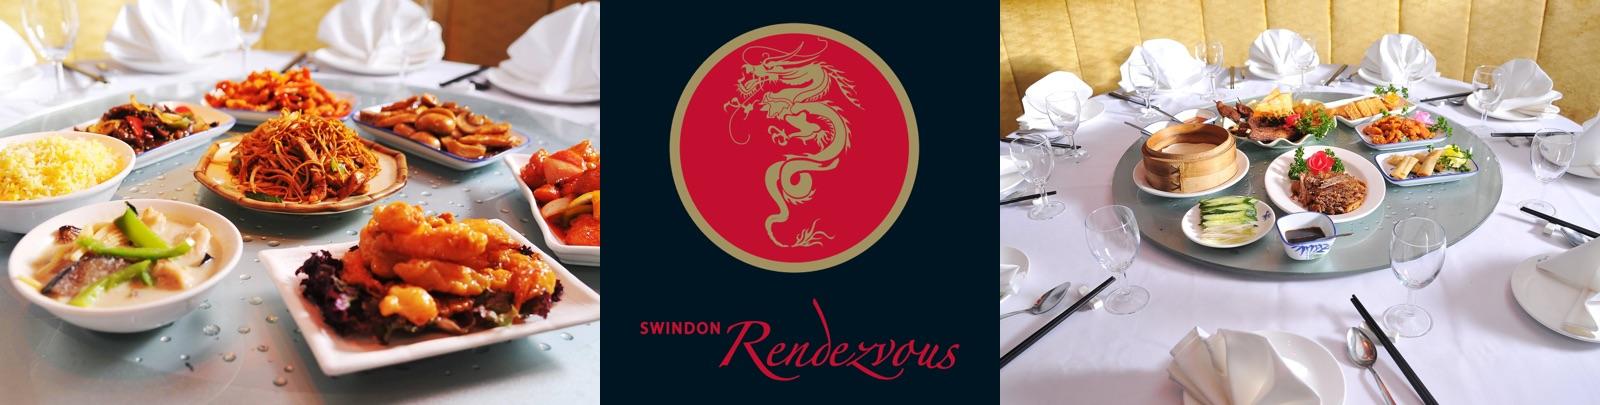 Swindon Rendezvous Restaurant Swindon Oriental Cuisine